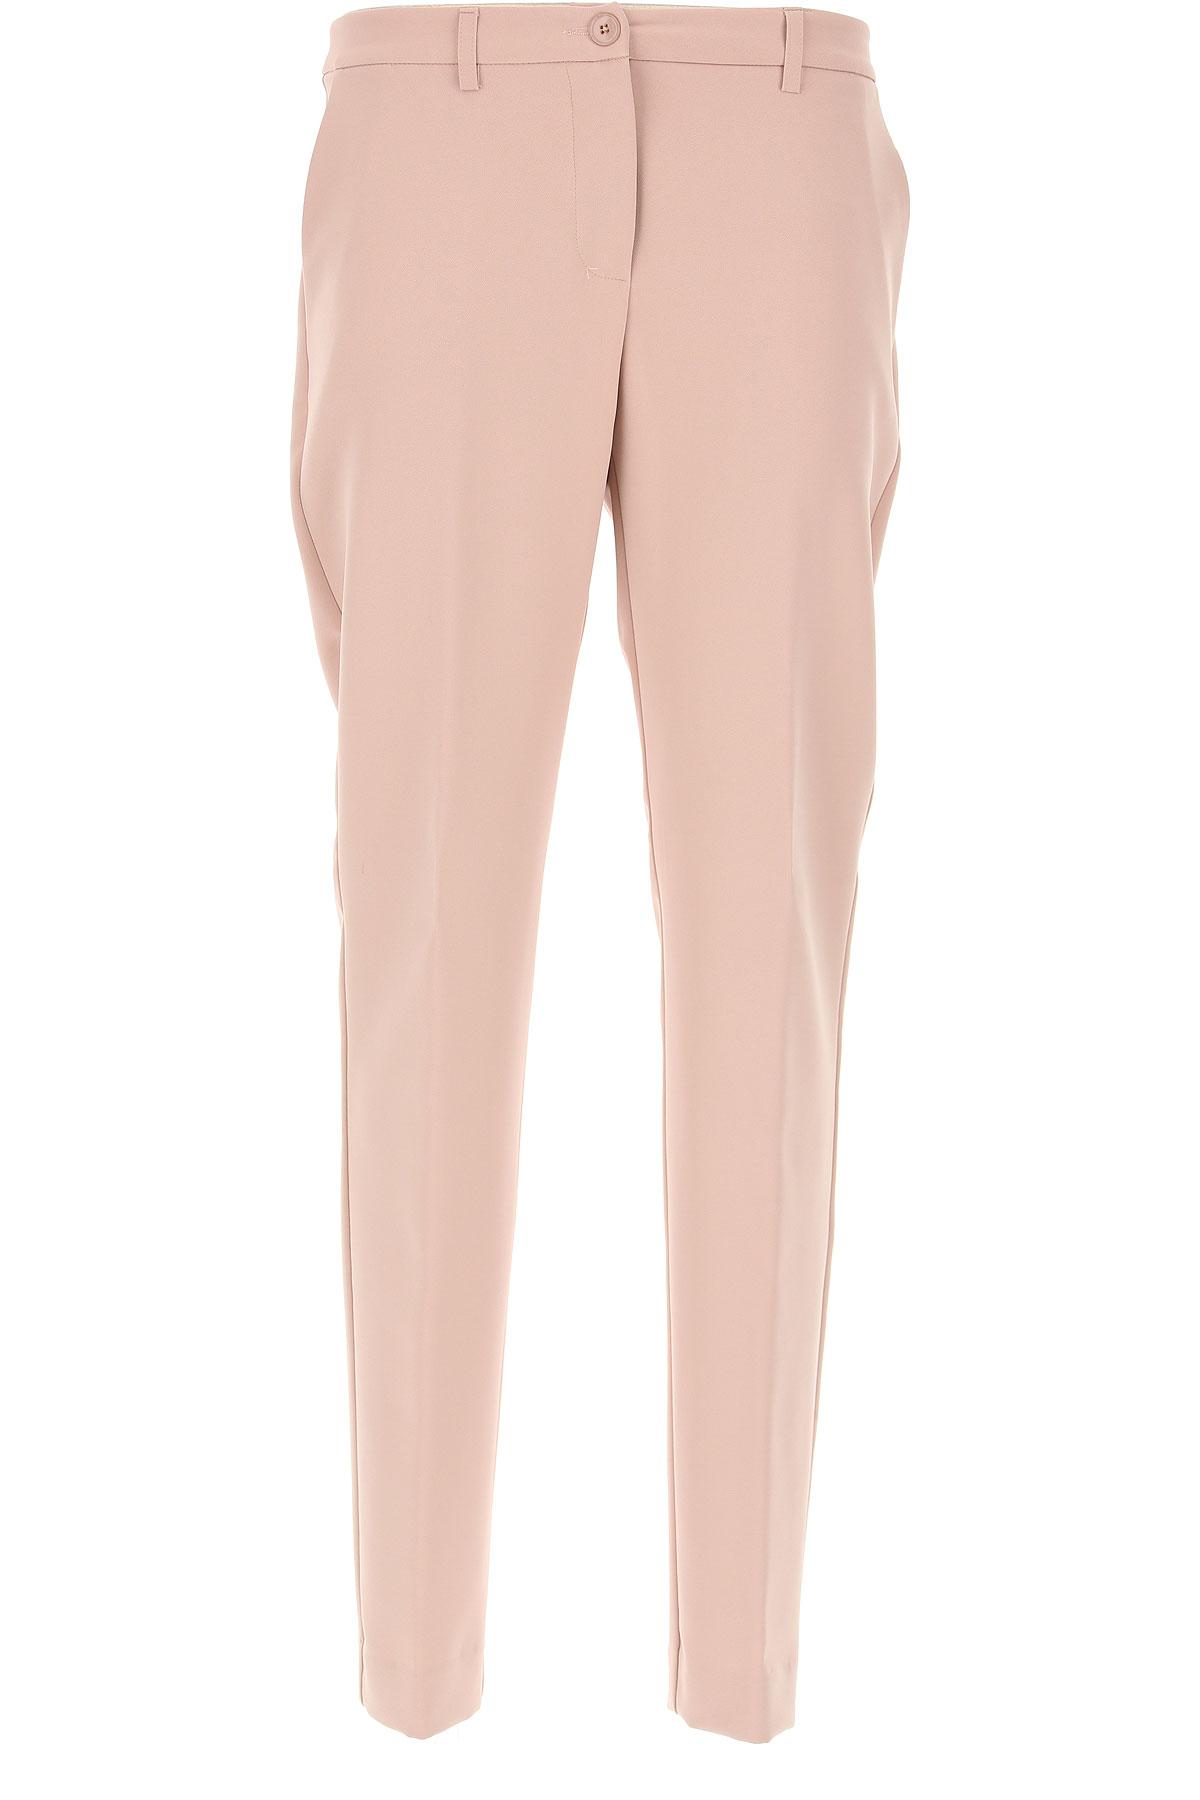 Image of Blugirl Pants for Women, Powder Pink, polyester, 2017, 26 28 30